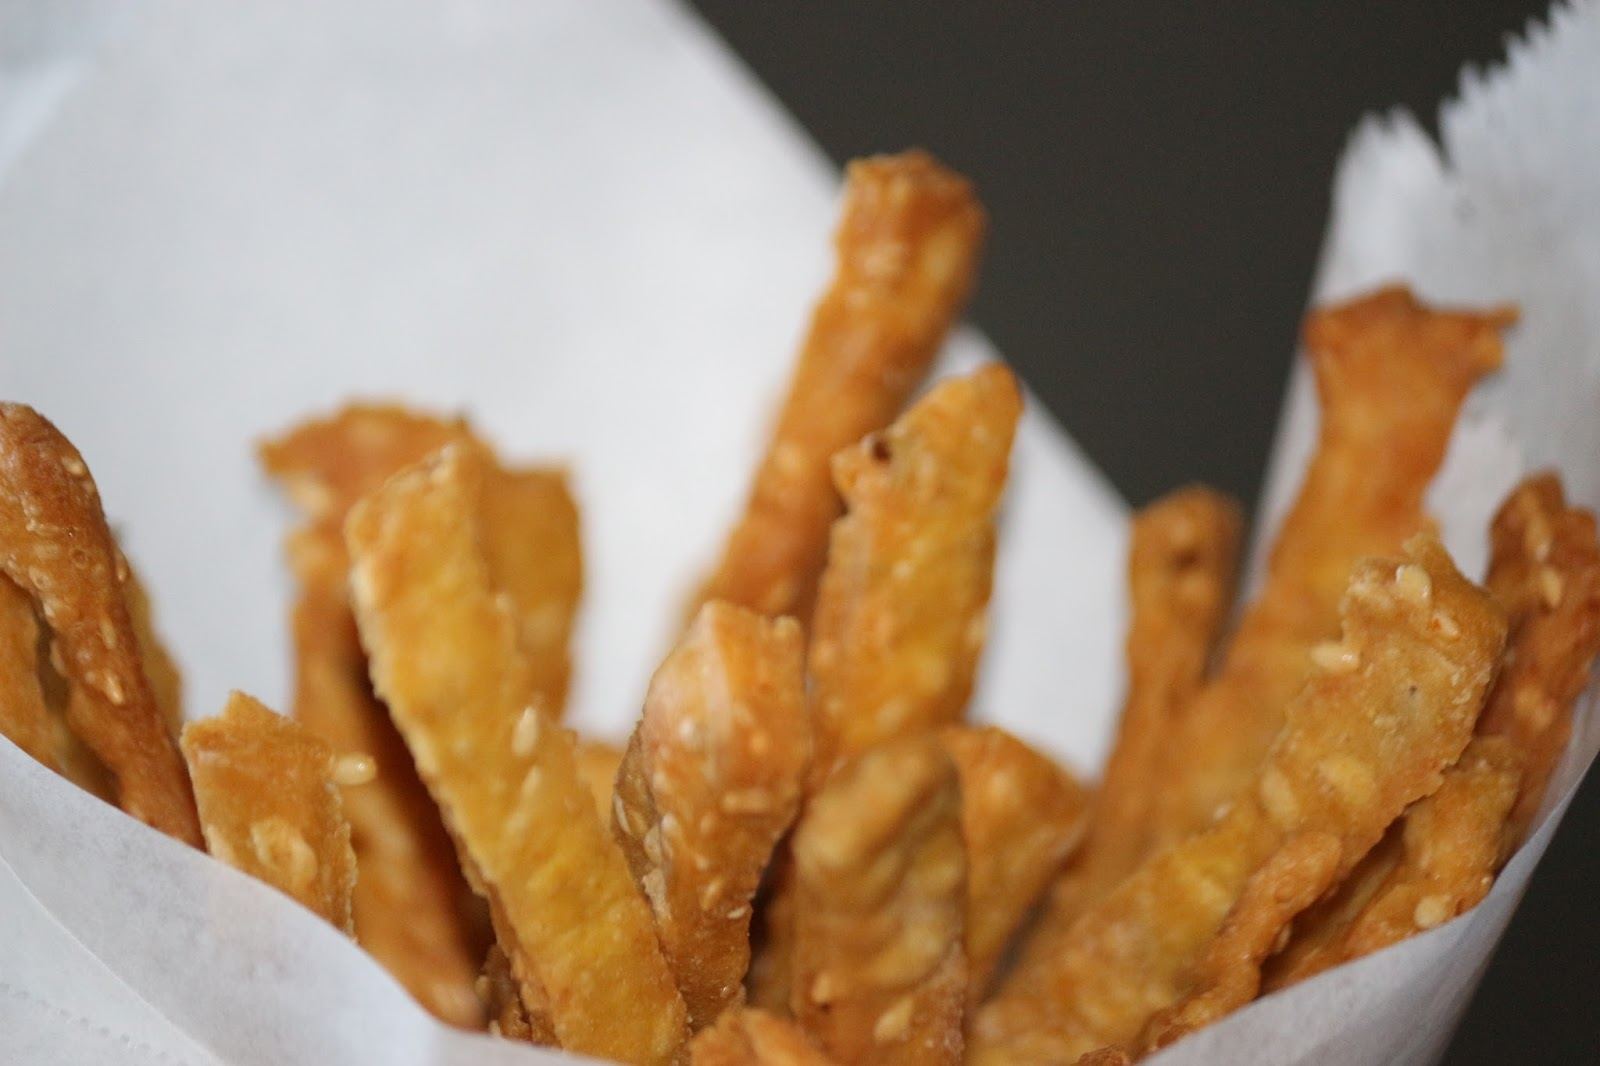 Megha's Creations: Recipe - Homemade Sesame Sticks (Tea time snack)